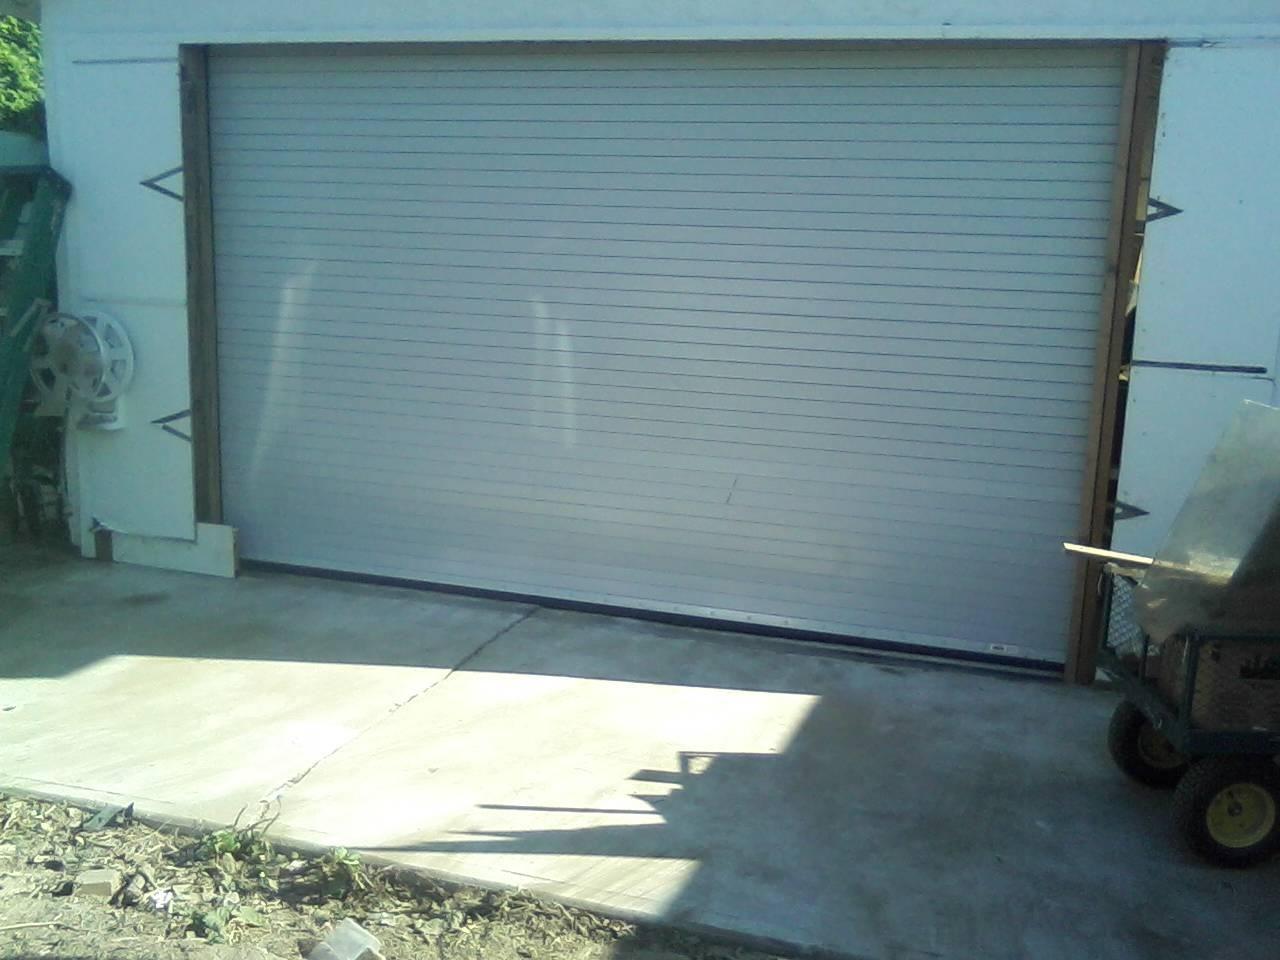 Porvene 324 installed by SoCal Garage Www.diygaragerepair